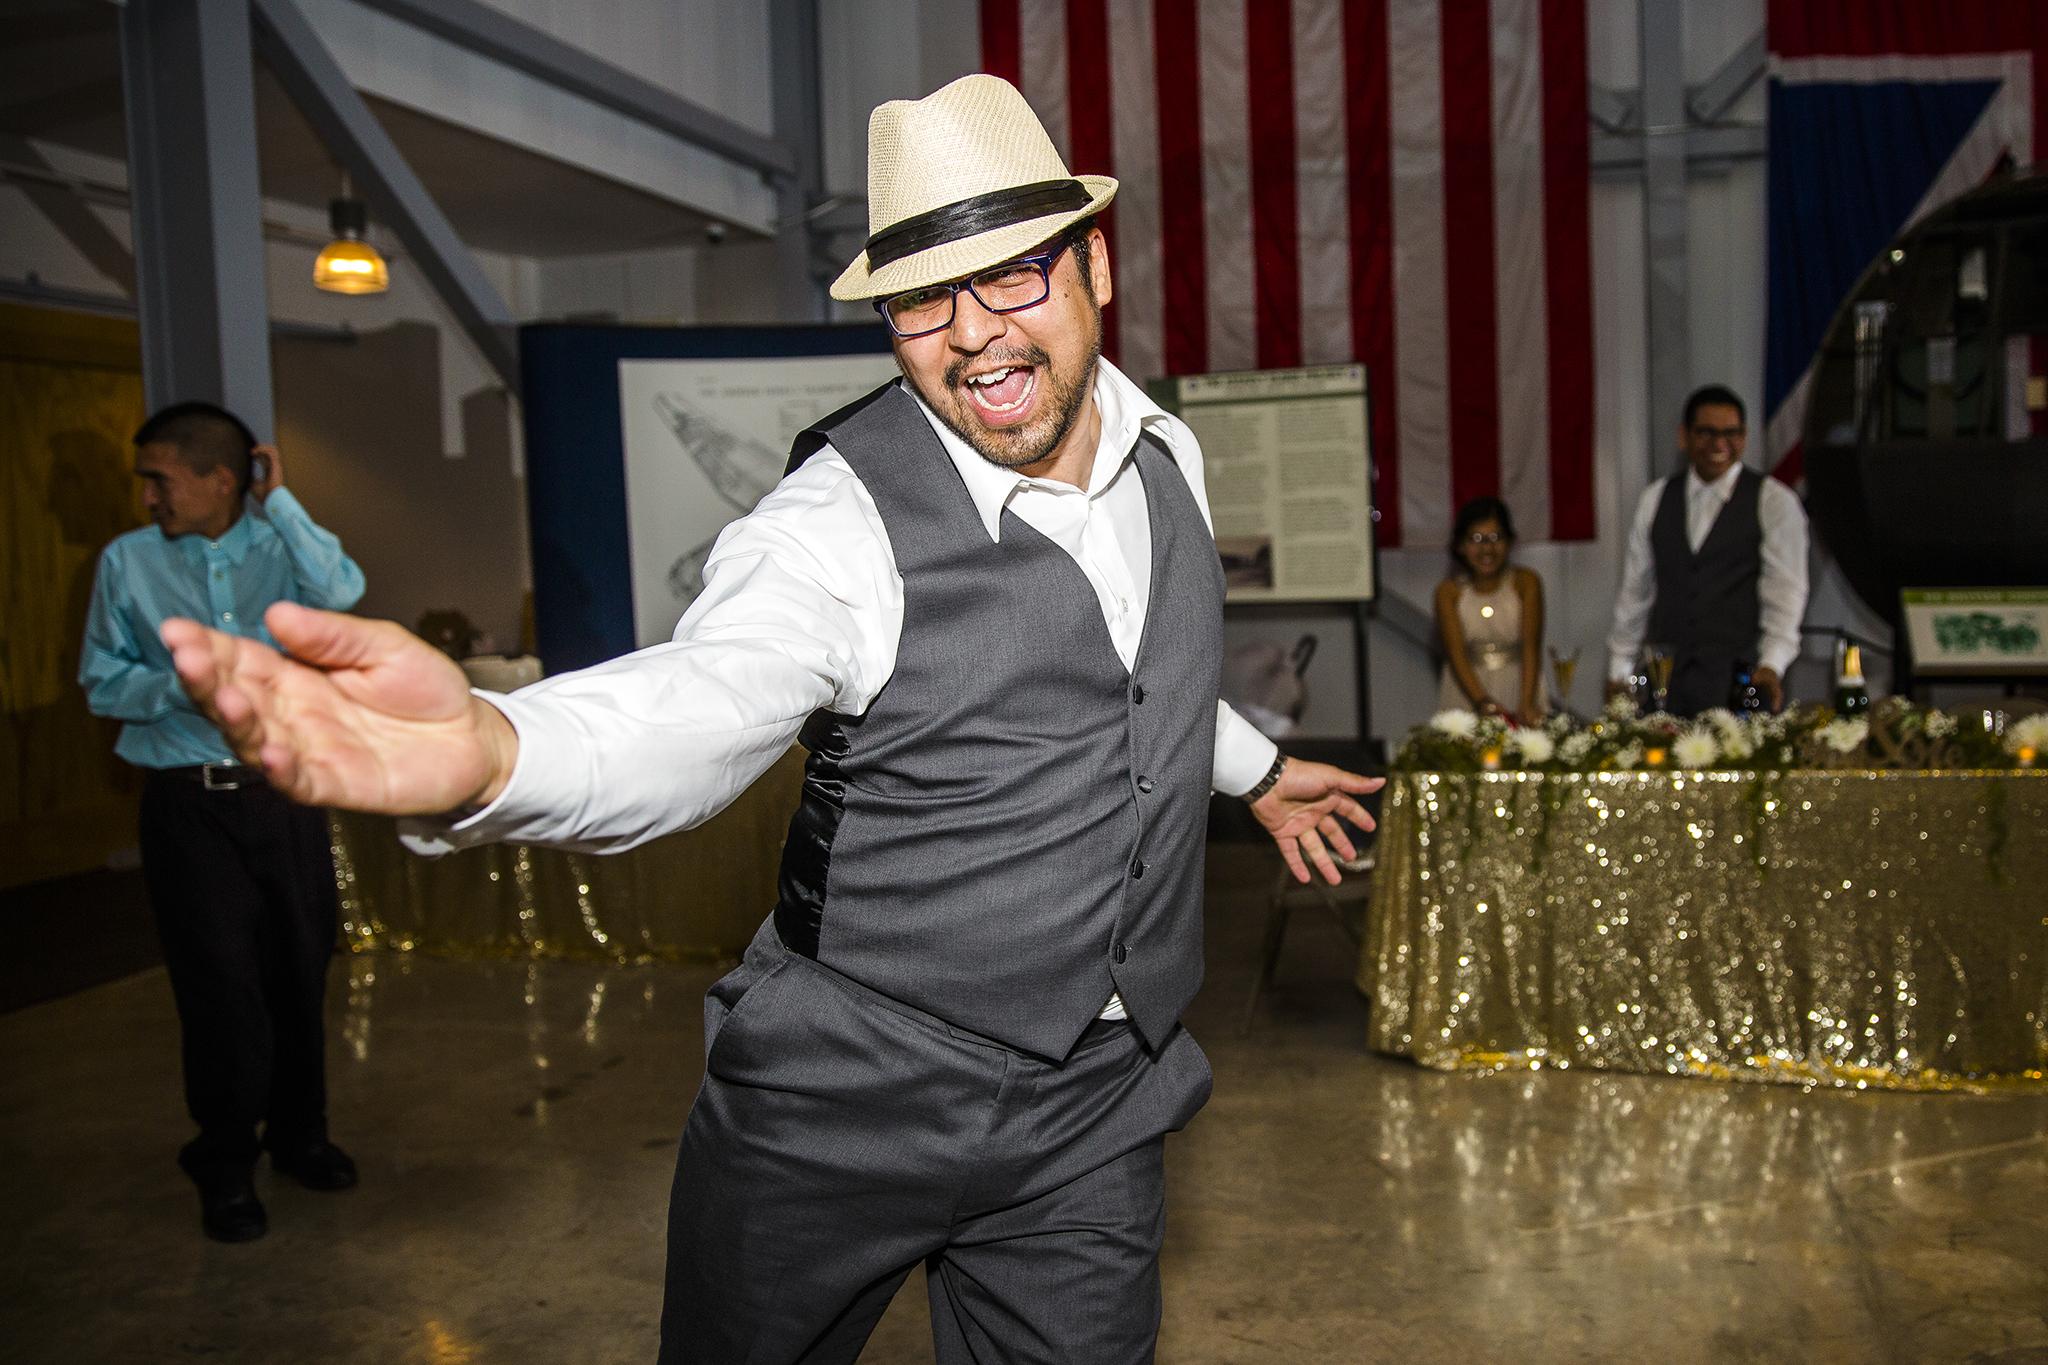 wedding reception, wedding dance, fun dance pictures